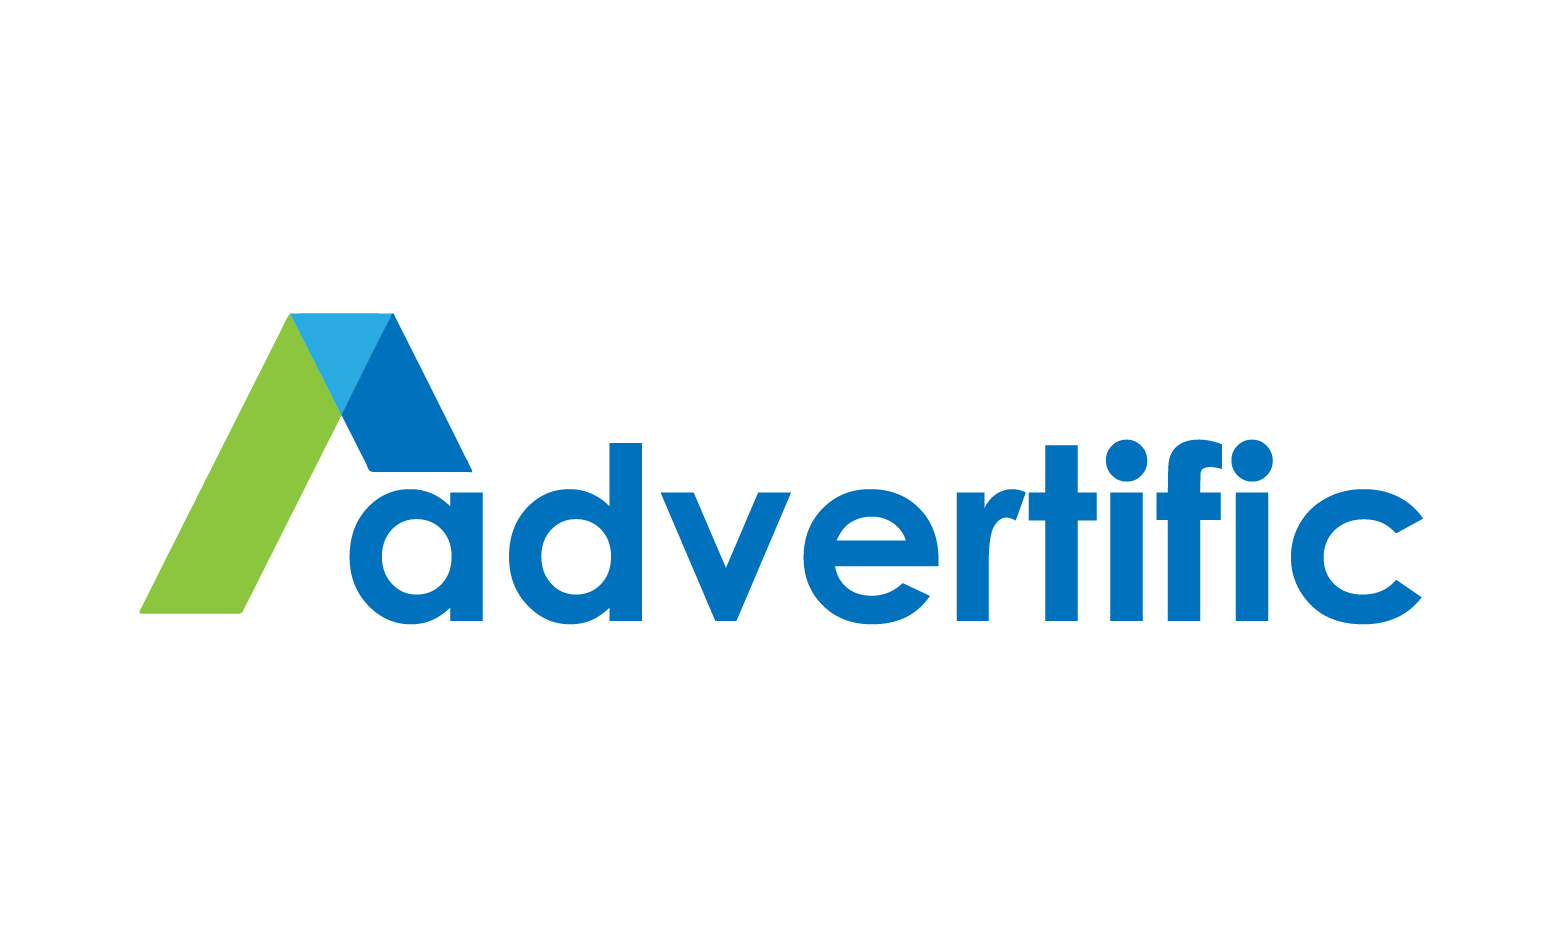 Advertific.com